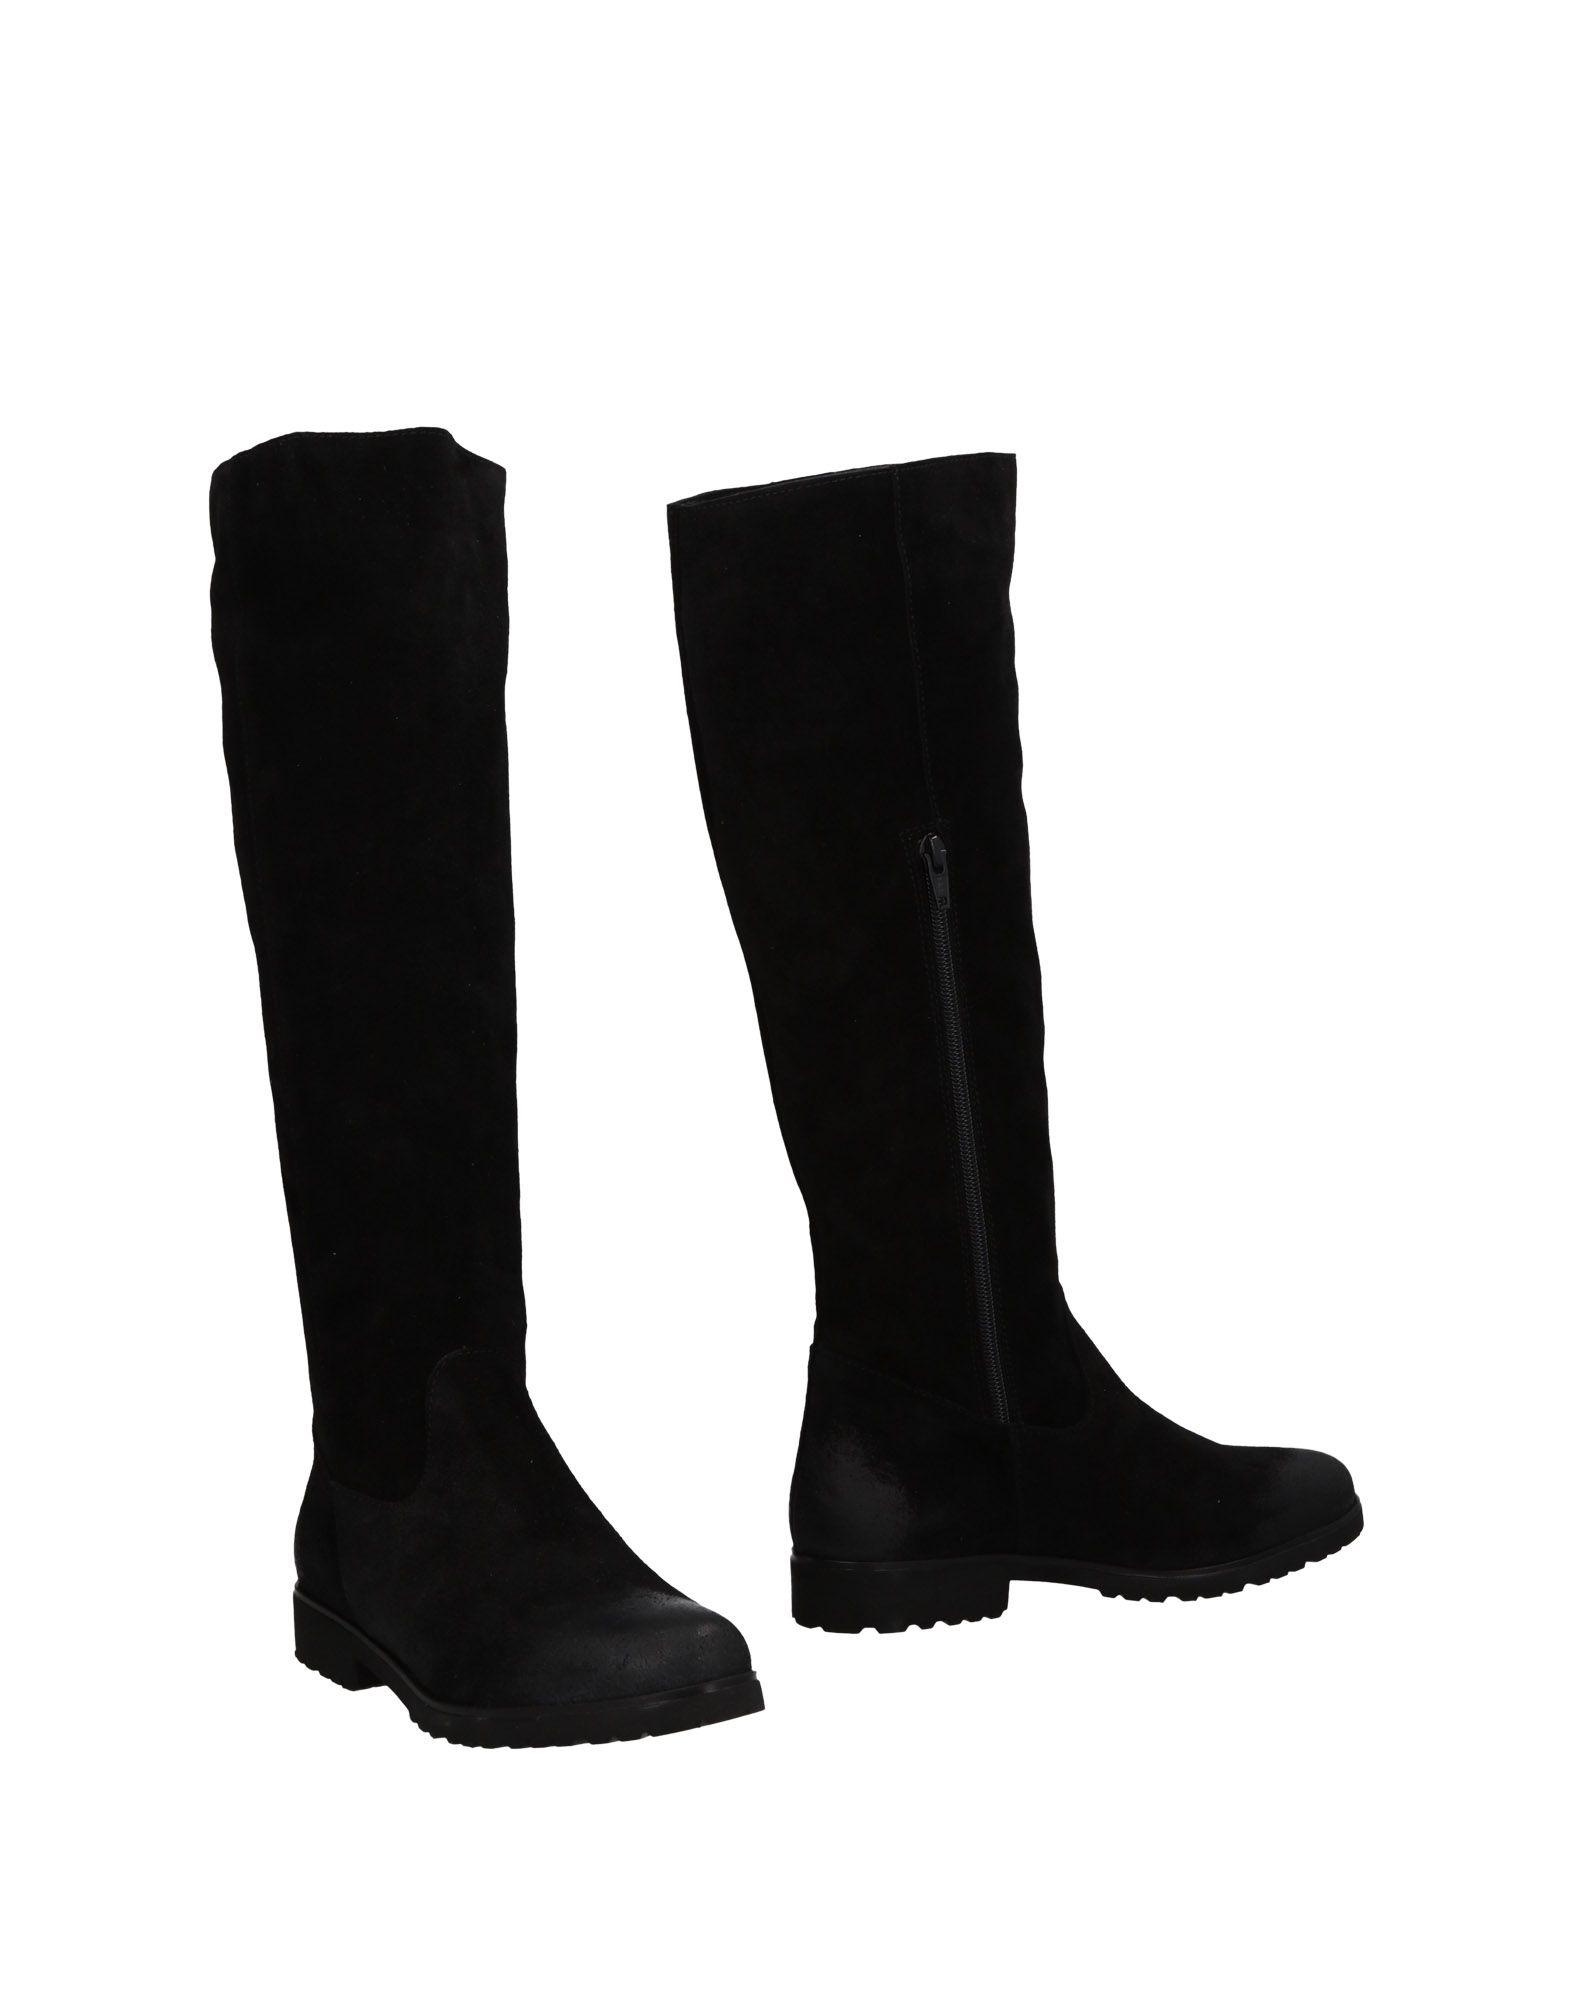 Nila & Nila Stiefel Damen  11474219PP Neue Schuhe